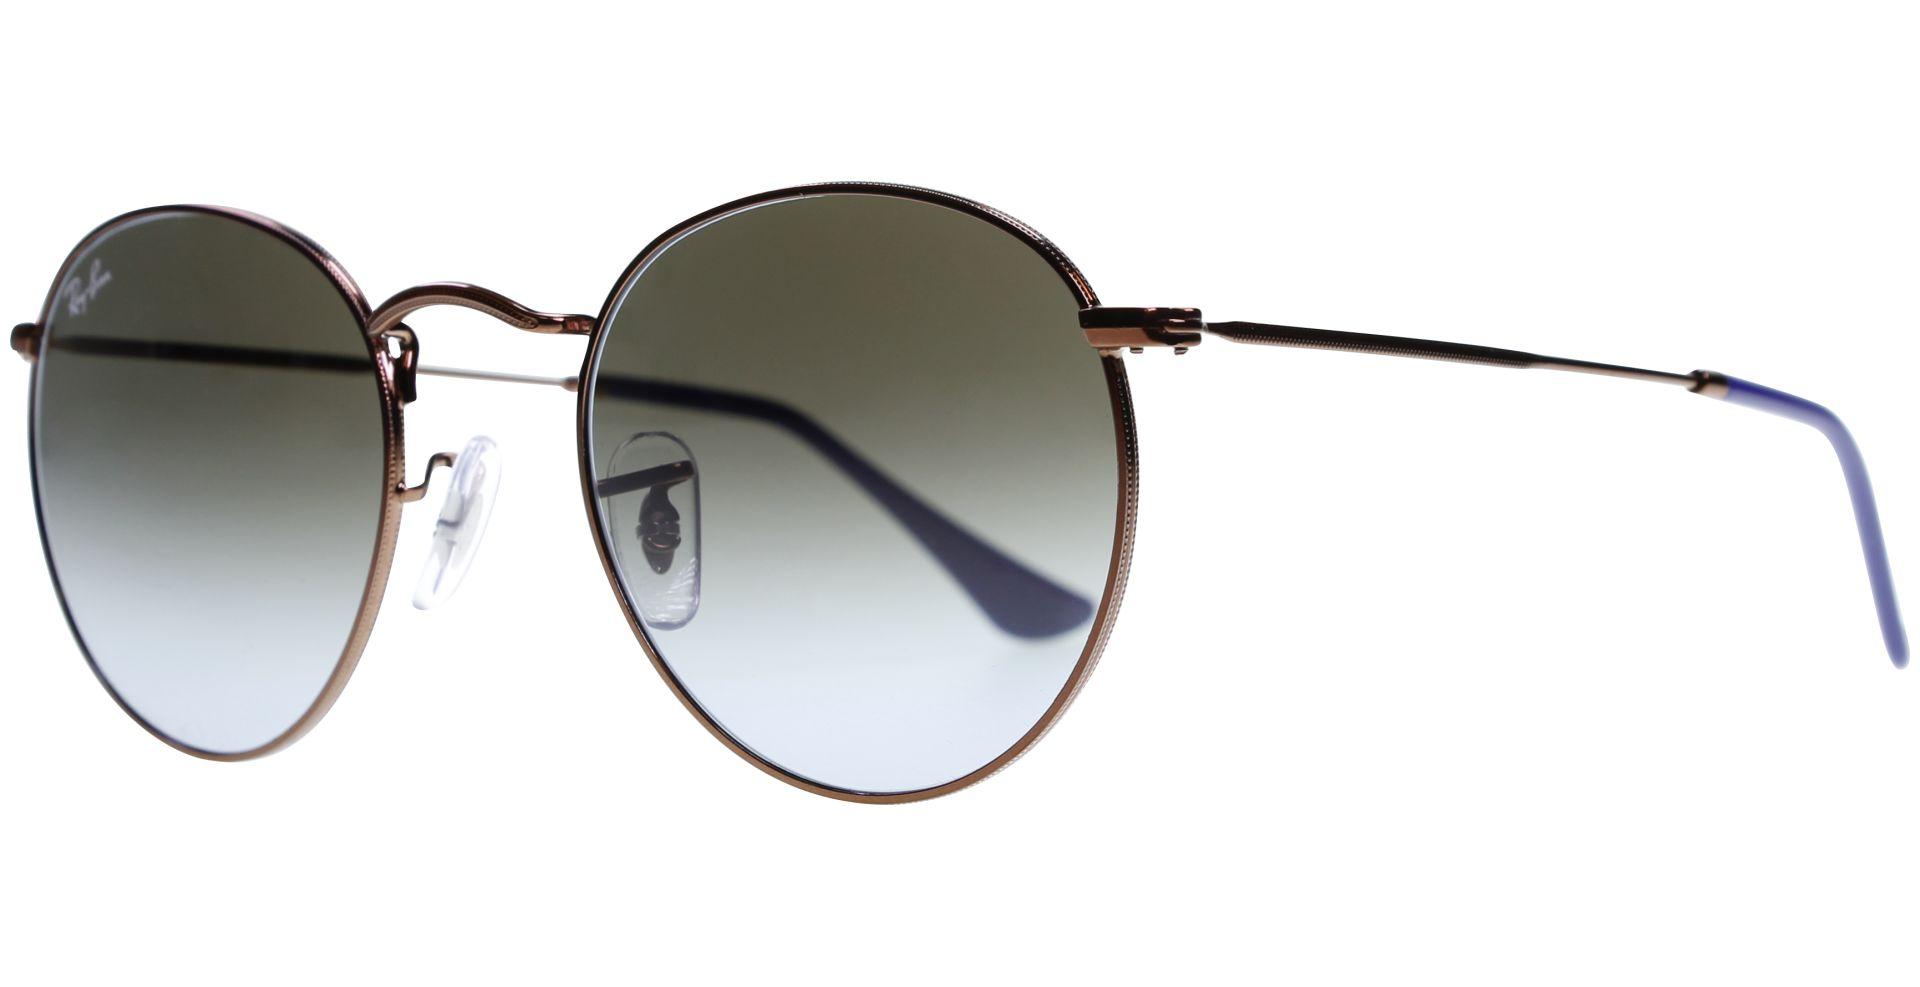 Ray-Ban RB3447 Sonnenbrille Schwarz glänzend 002/4O 53mm NxPATQjhHn